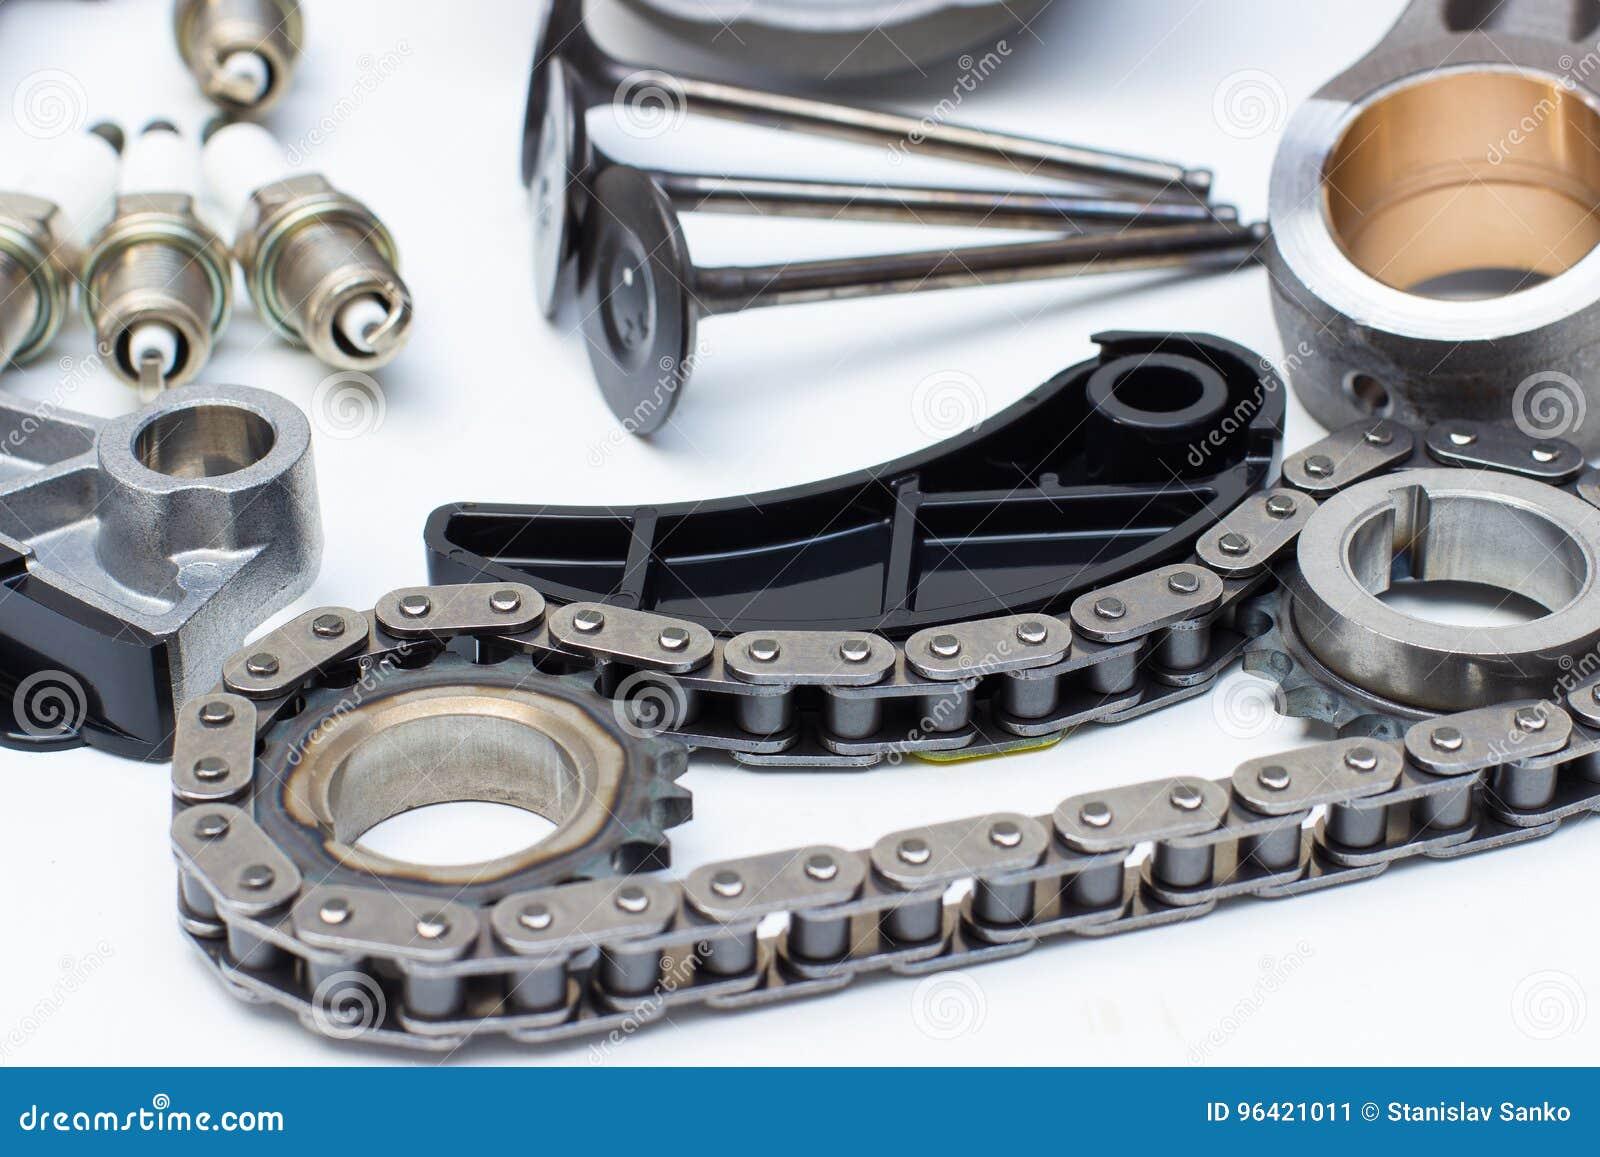 Group Automobile Engine Parts Isolated On White Stock Image - Image ...